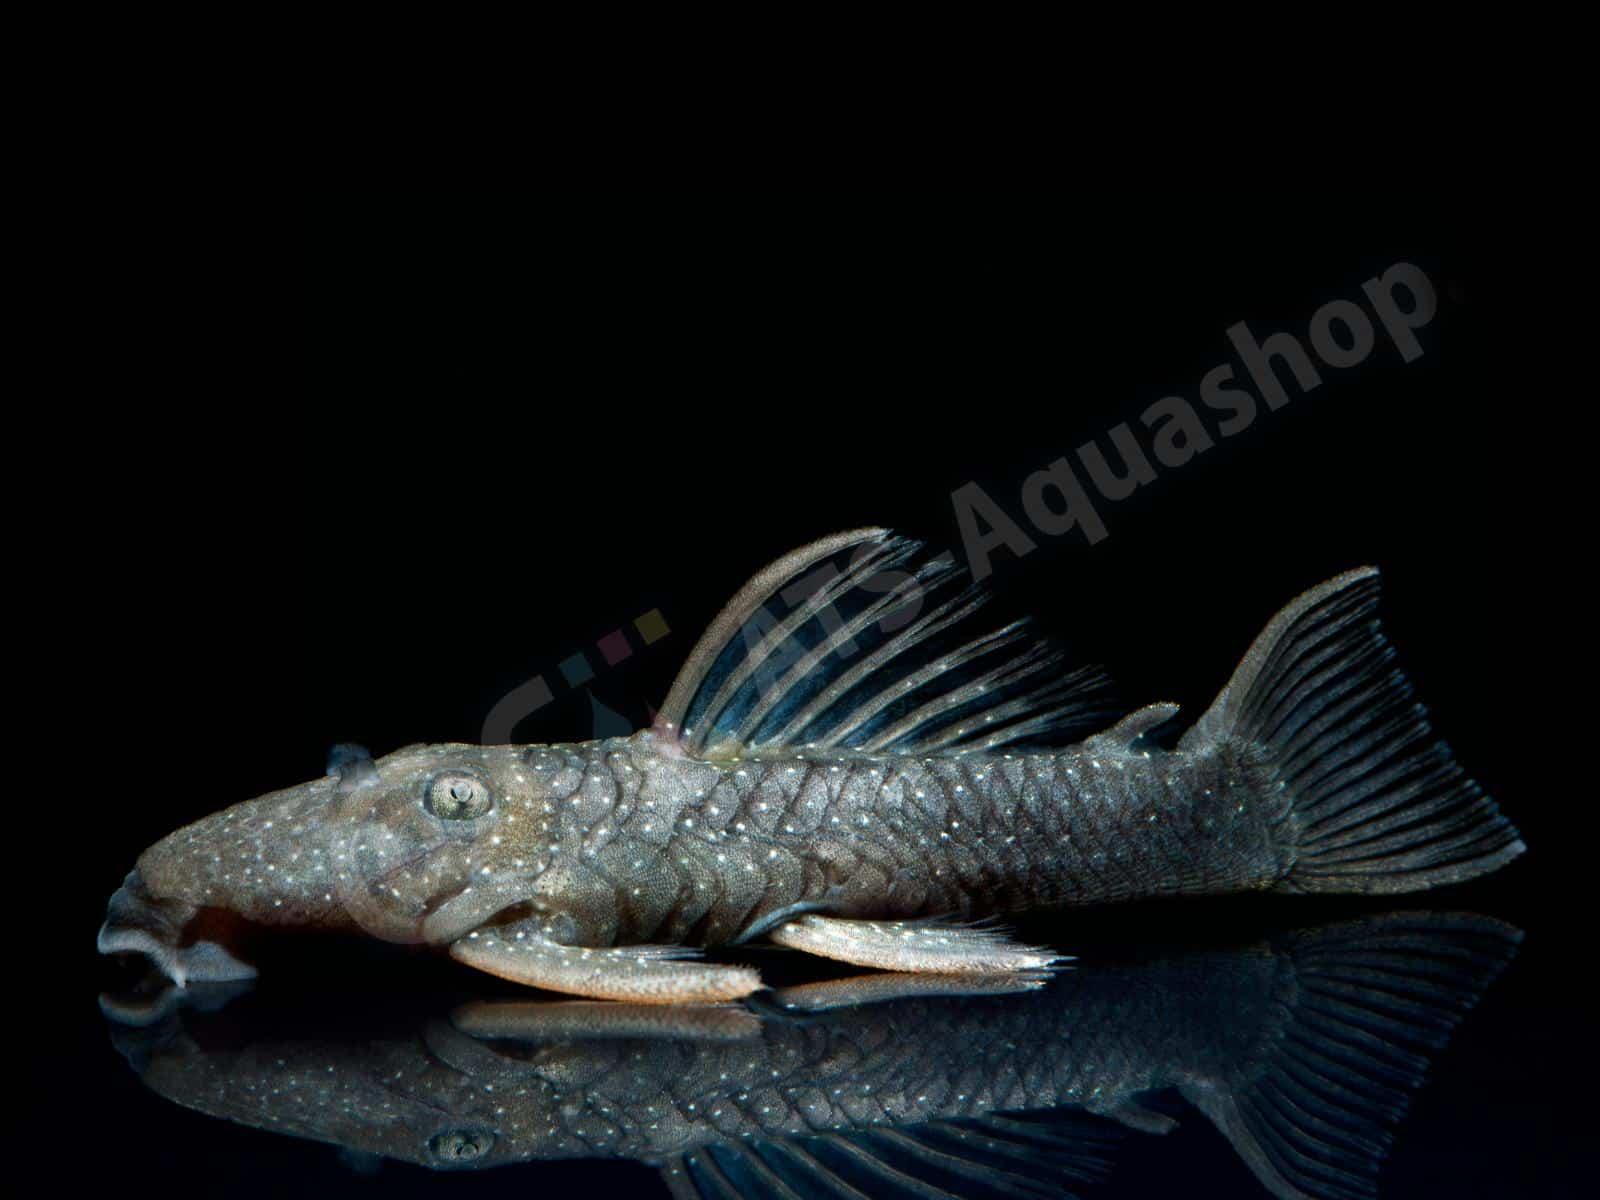 spectrancistrus murinus enrico richter 0292 8